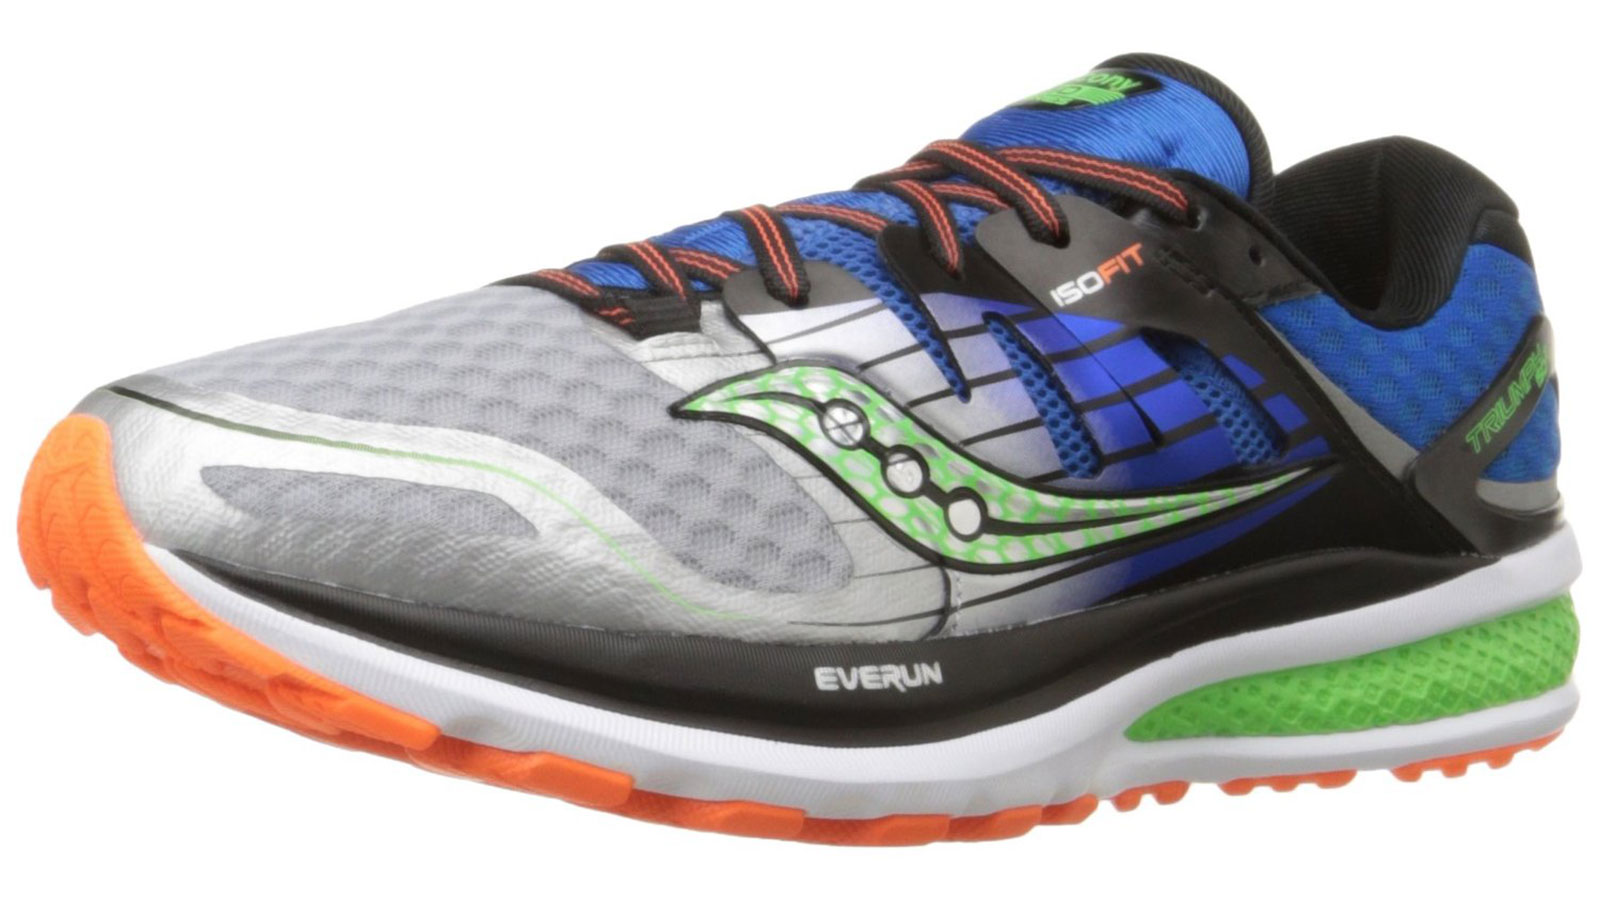 Saucony Triumph ISO 2 Men's Running Shoe | best running shoes for men